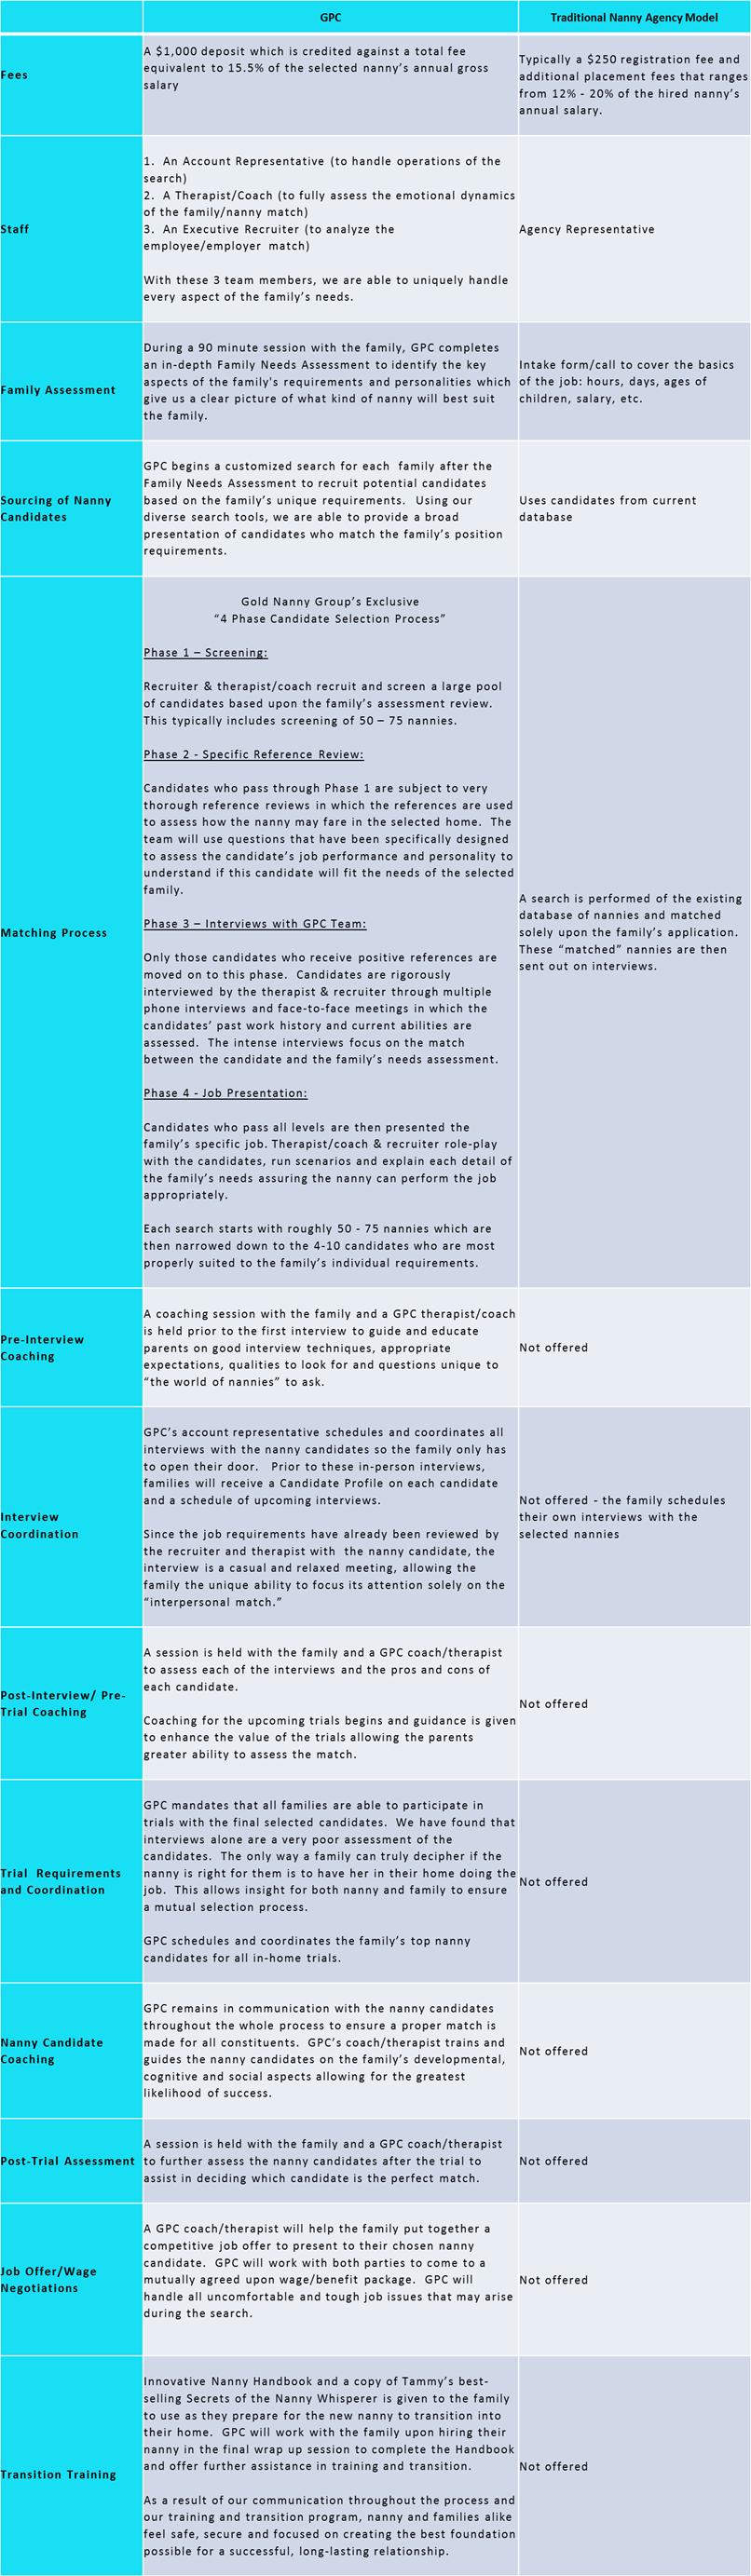 GPC vs Traditional Gency